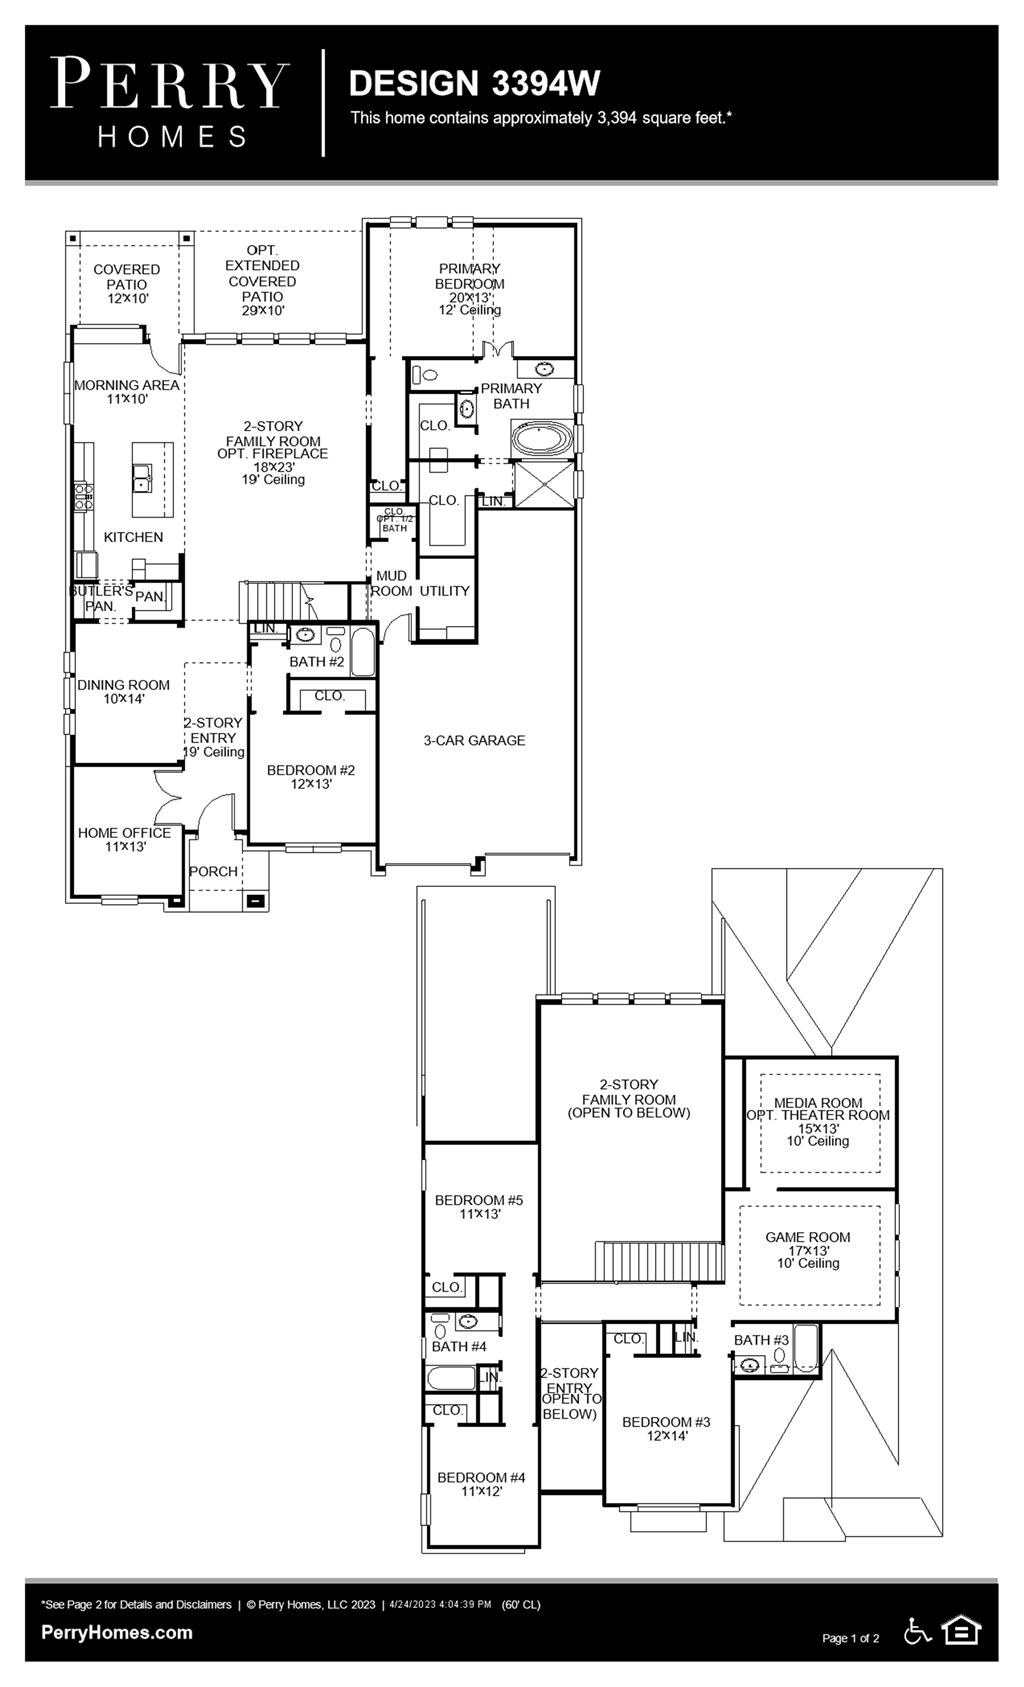 Floor Plan for 3394W